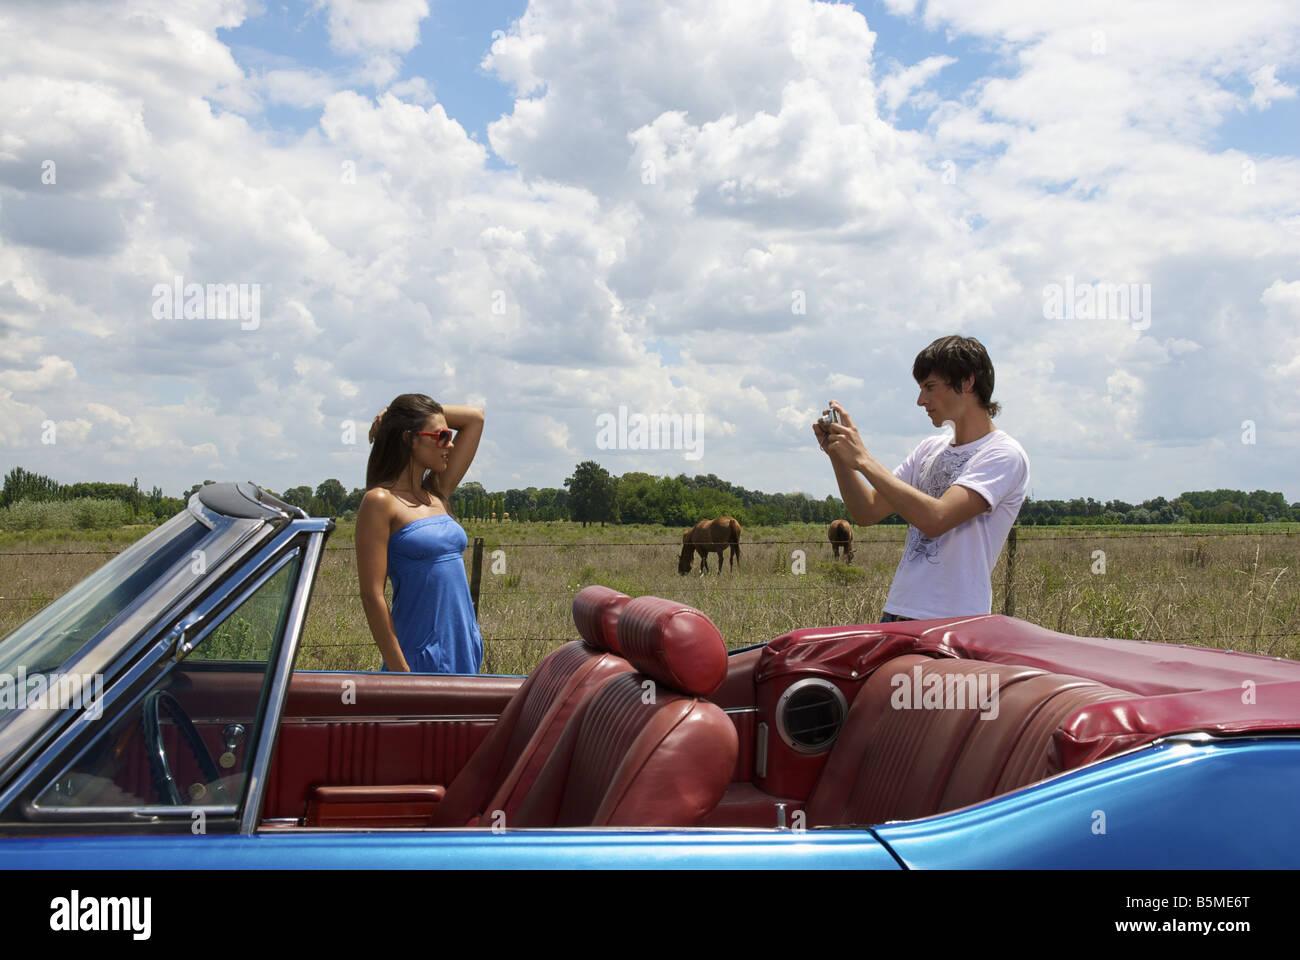 Un jeune couple taking pictures Photo Stock